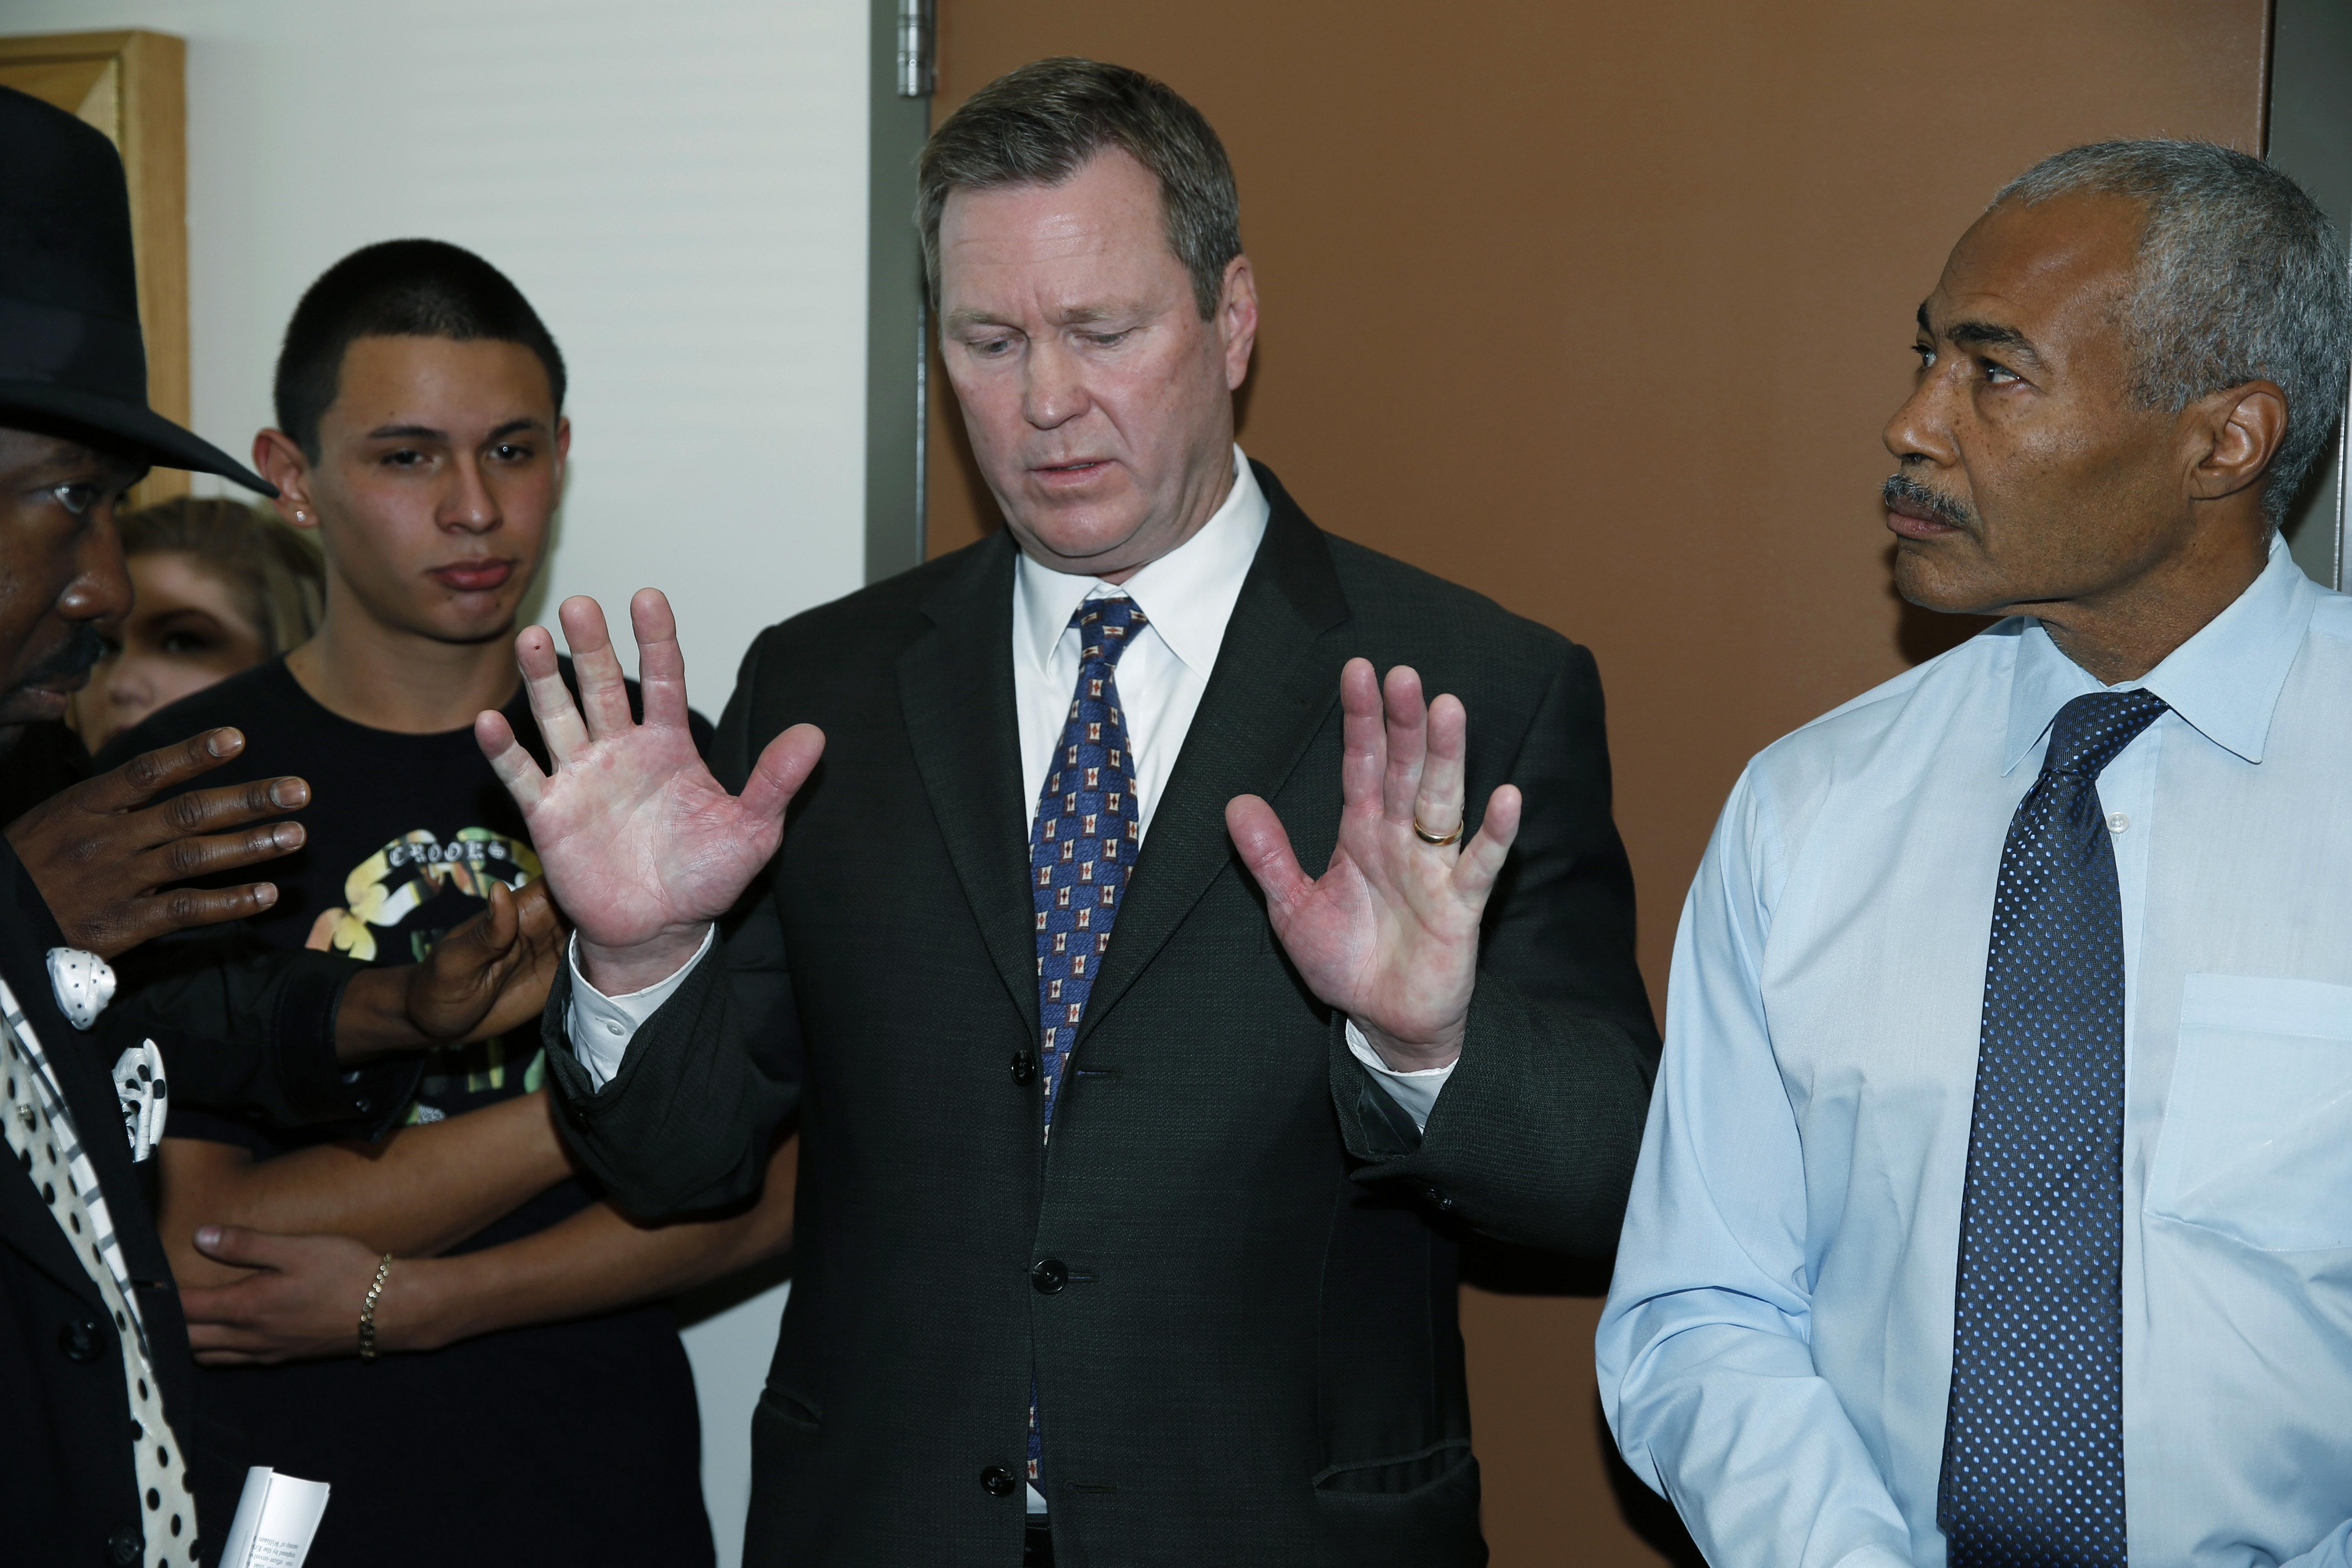 Photo: Chief deputy district attorneys (AP Photo)